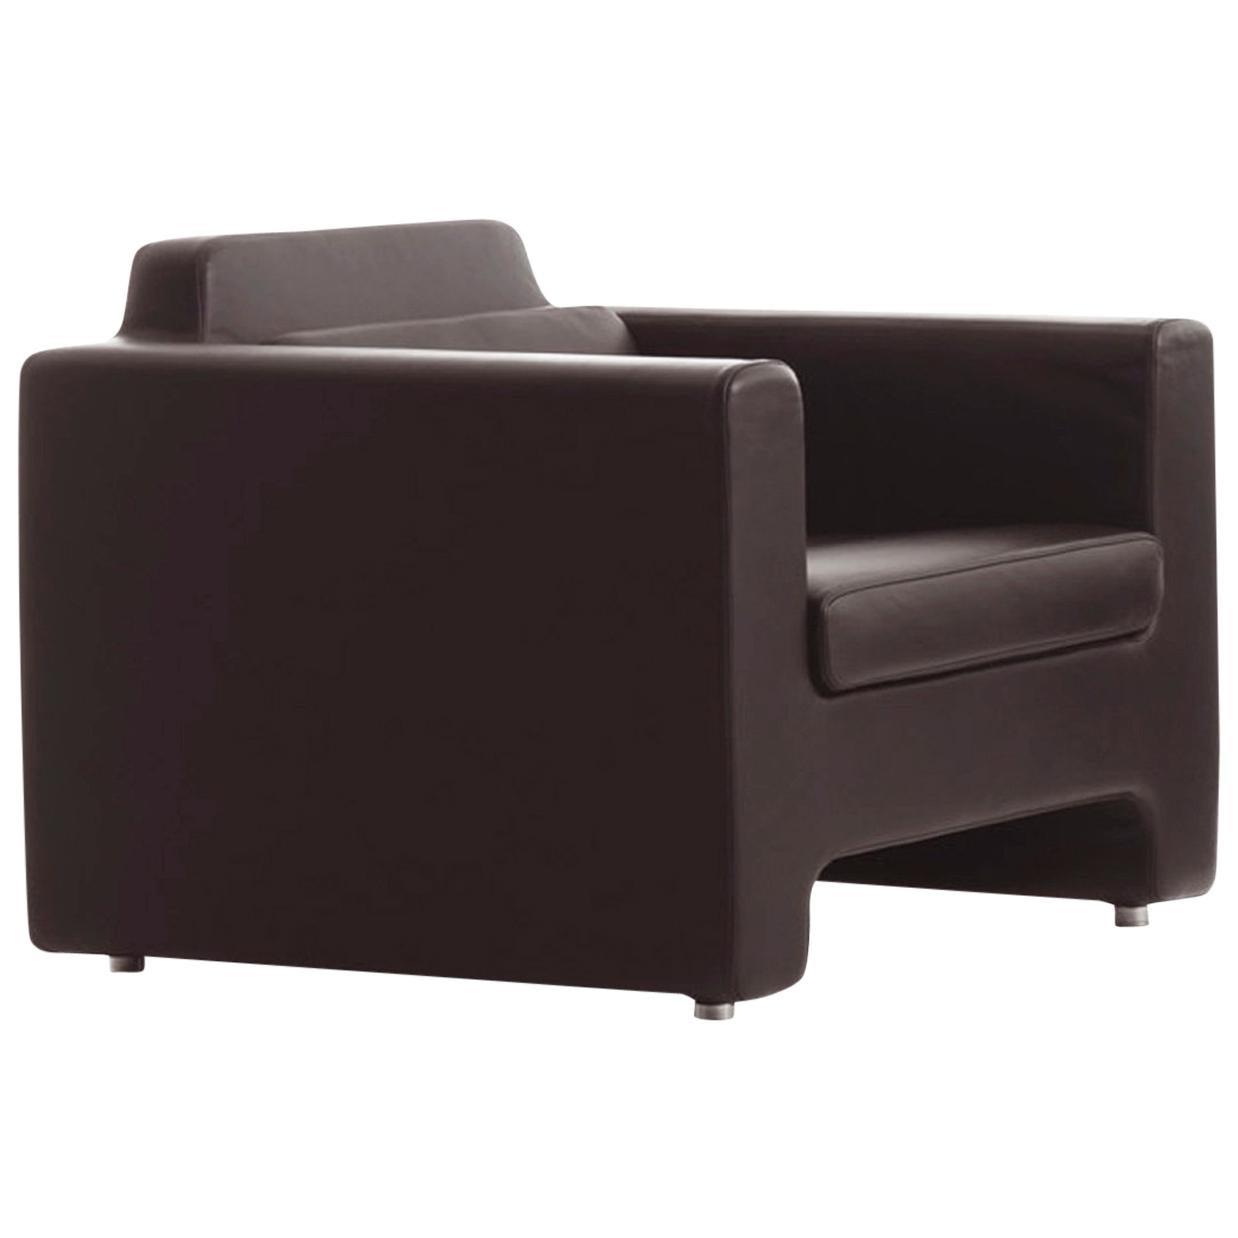 Baleri Italia Horizon Armchair in Brown Leather by Arik Levy